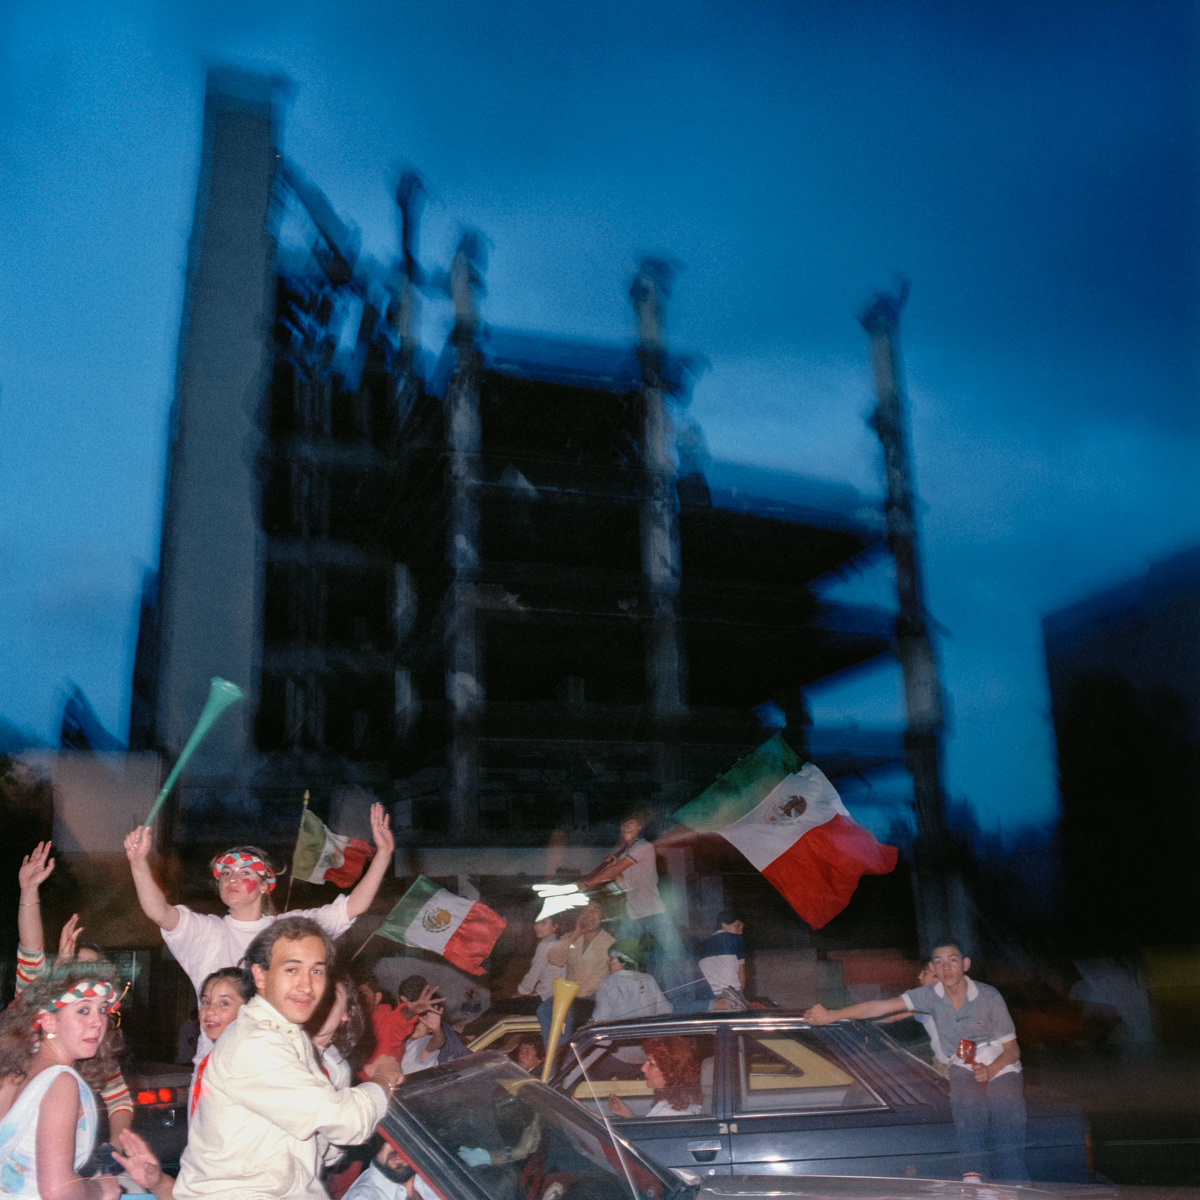 Earthquake Ruins and Soccer Celebrants, México City 1986